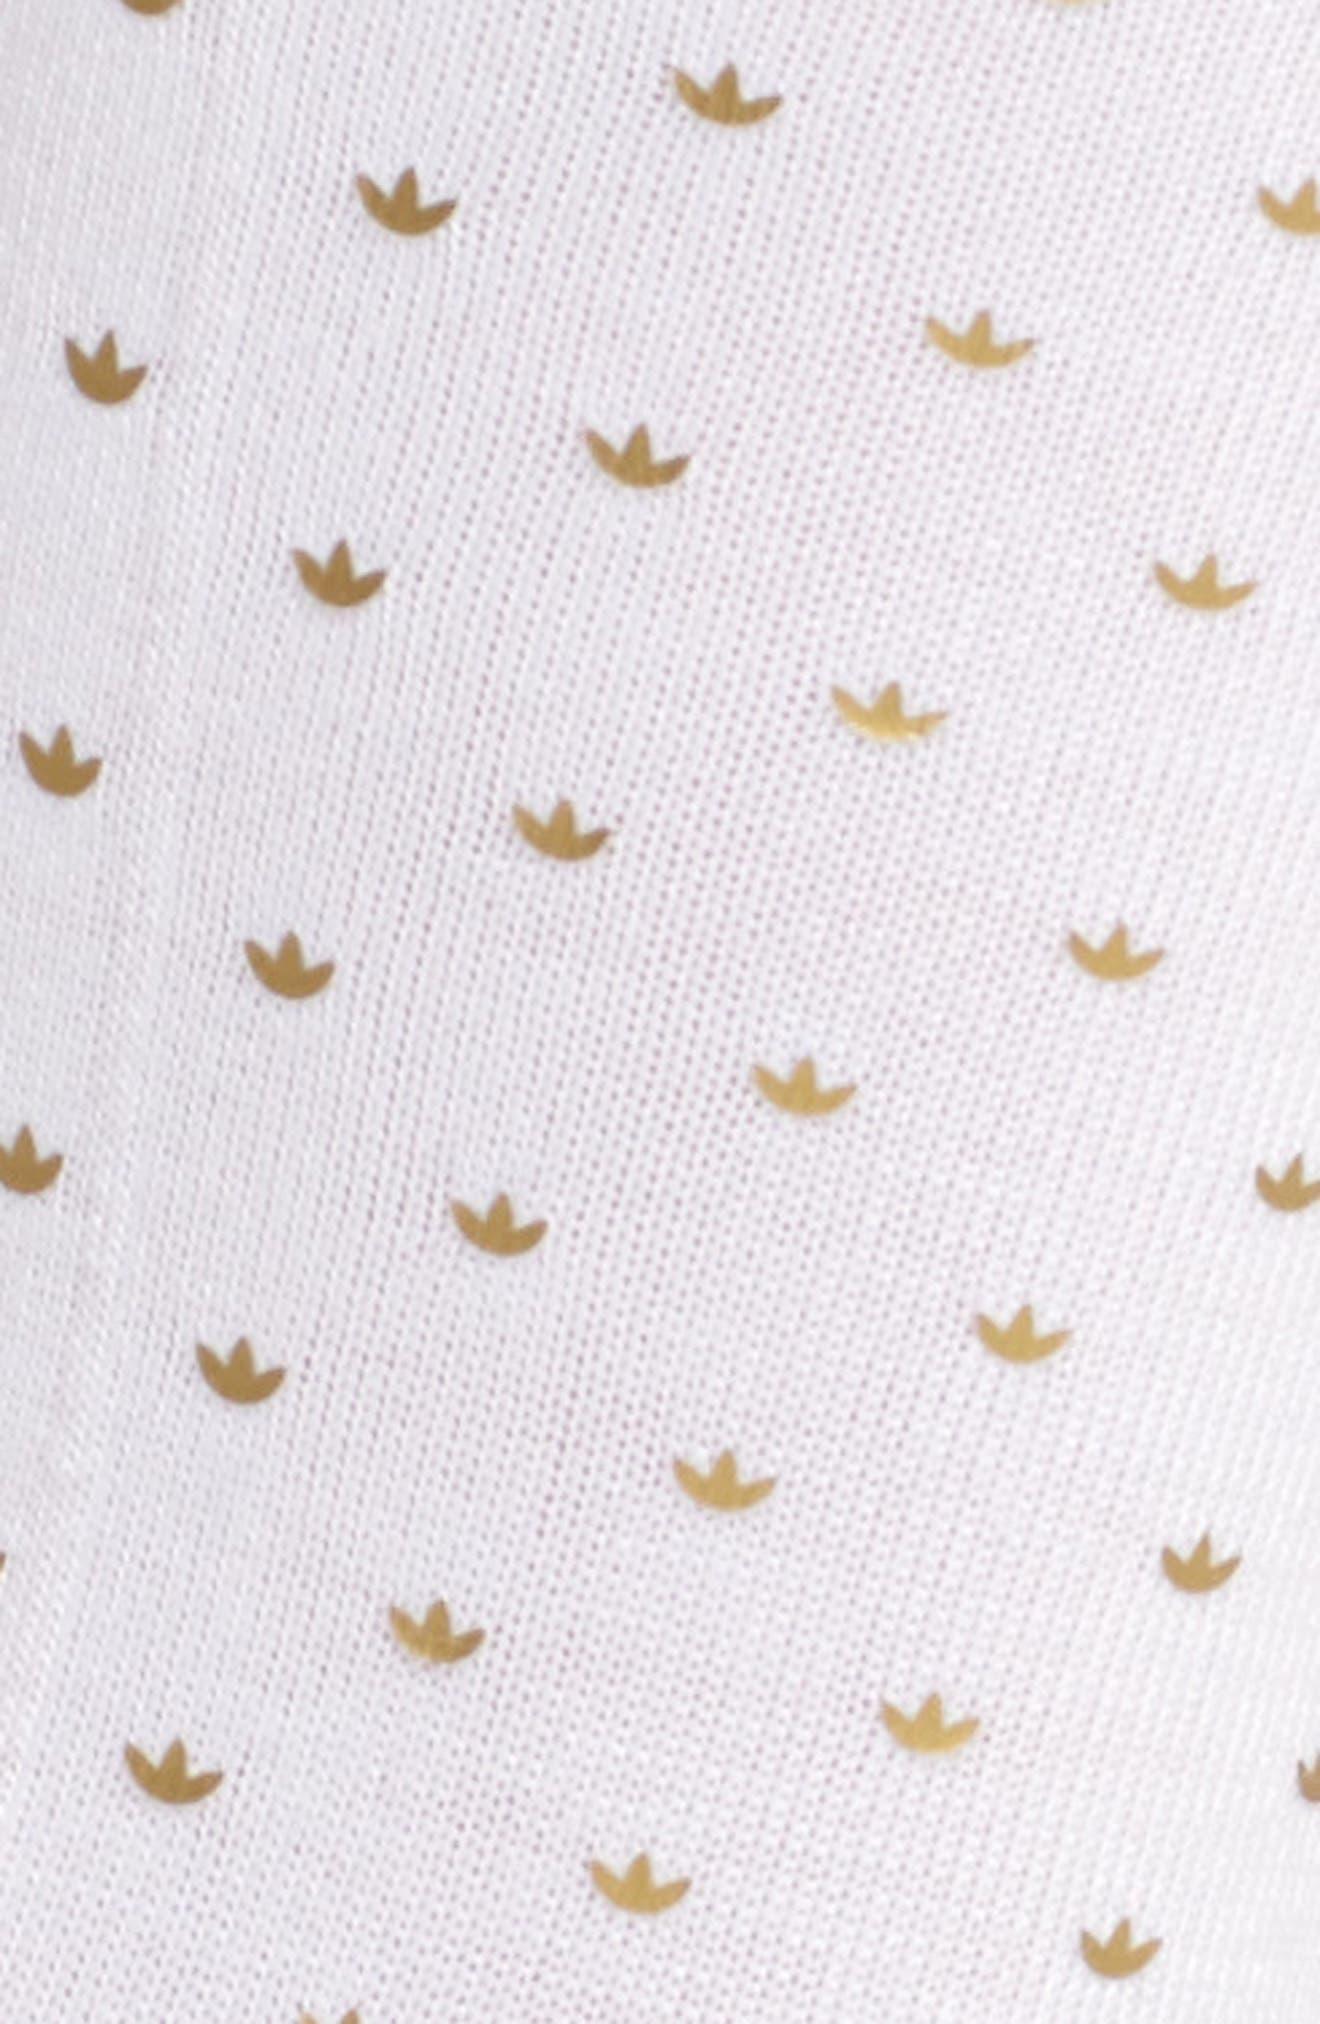 Mini Trefoil Crew Socks,                             Alternate thumbnail 2, color,                             White/ Gold